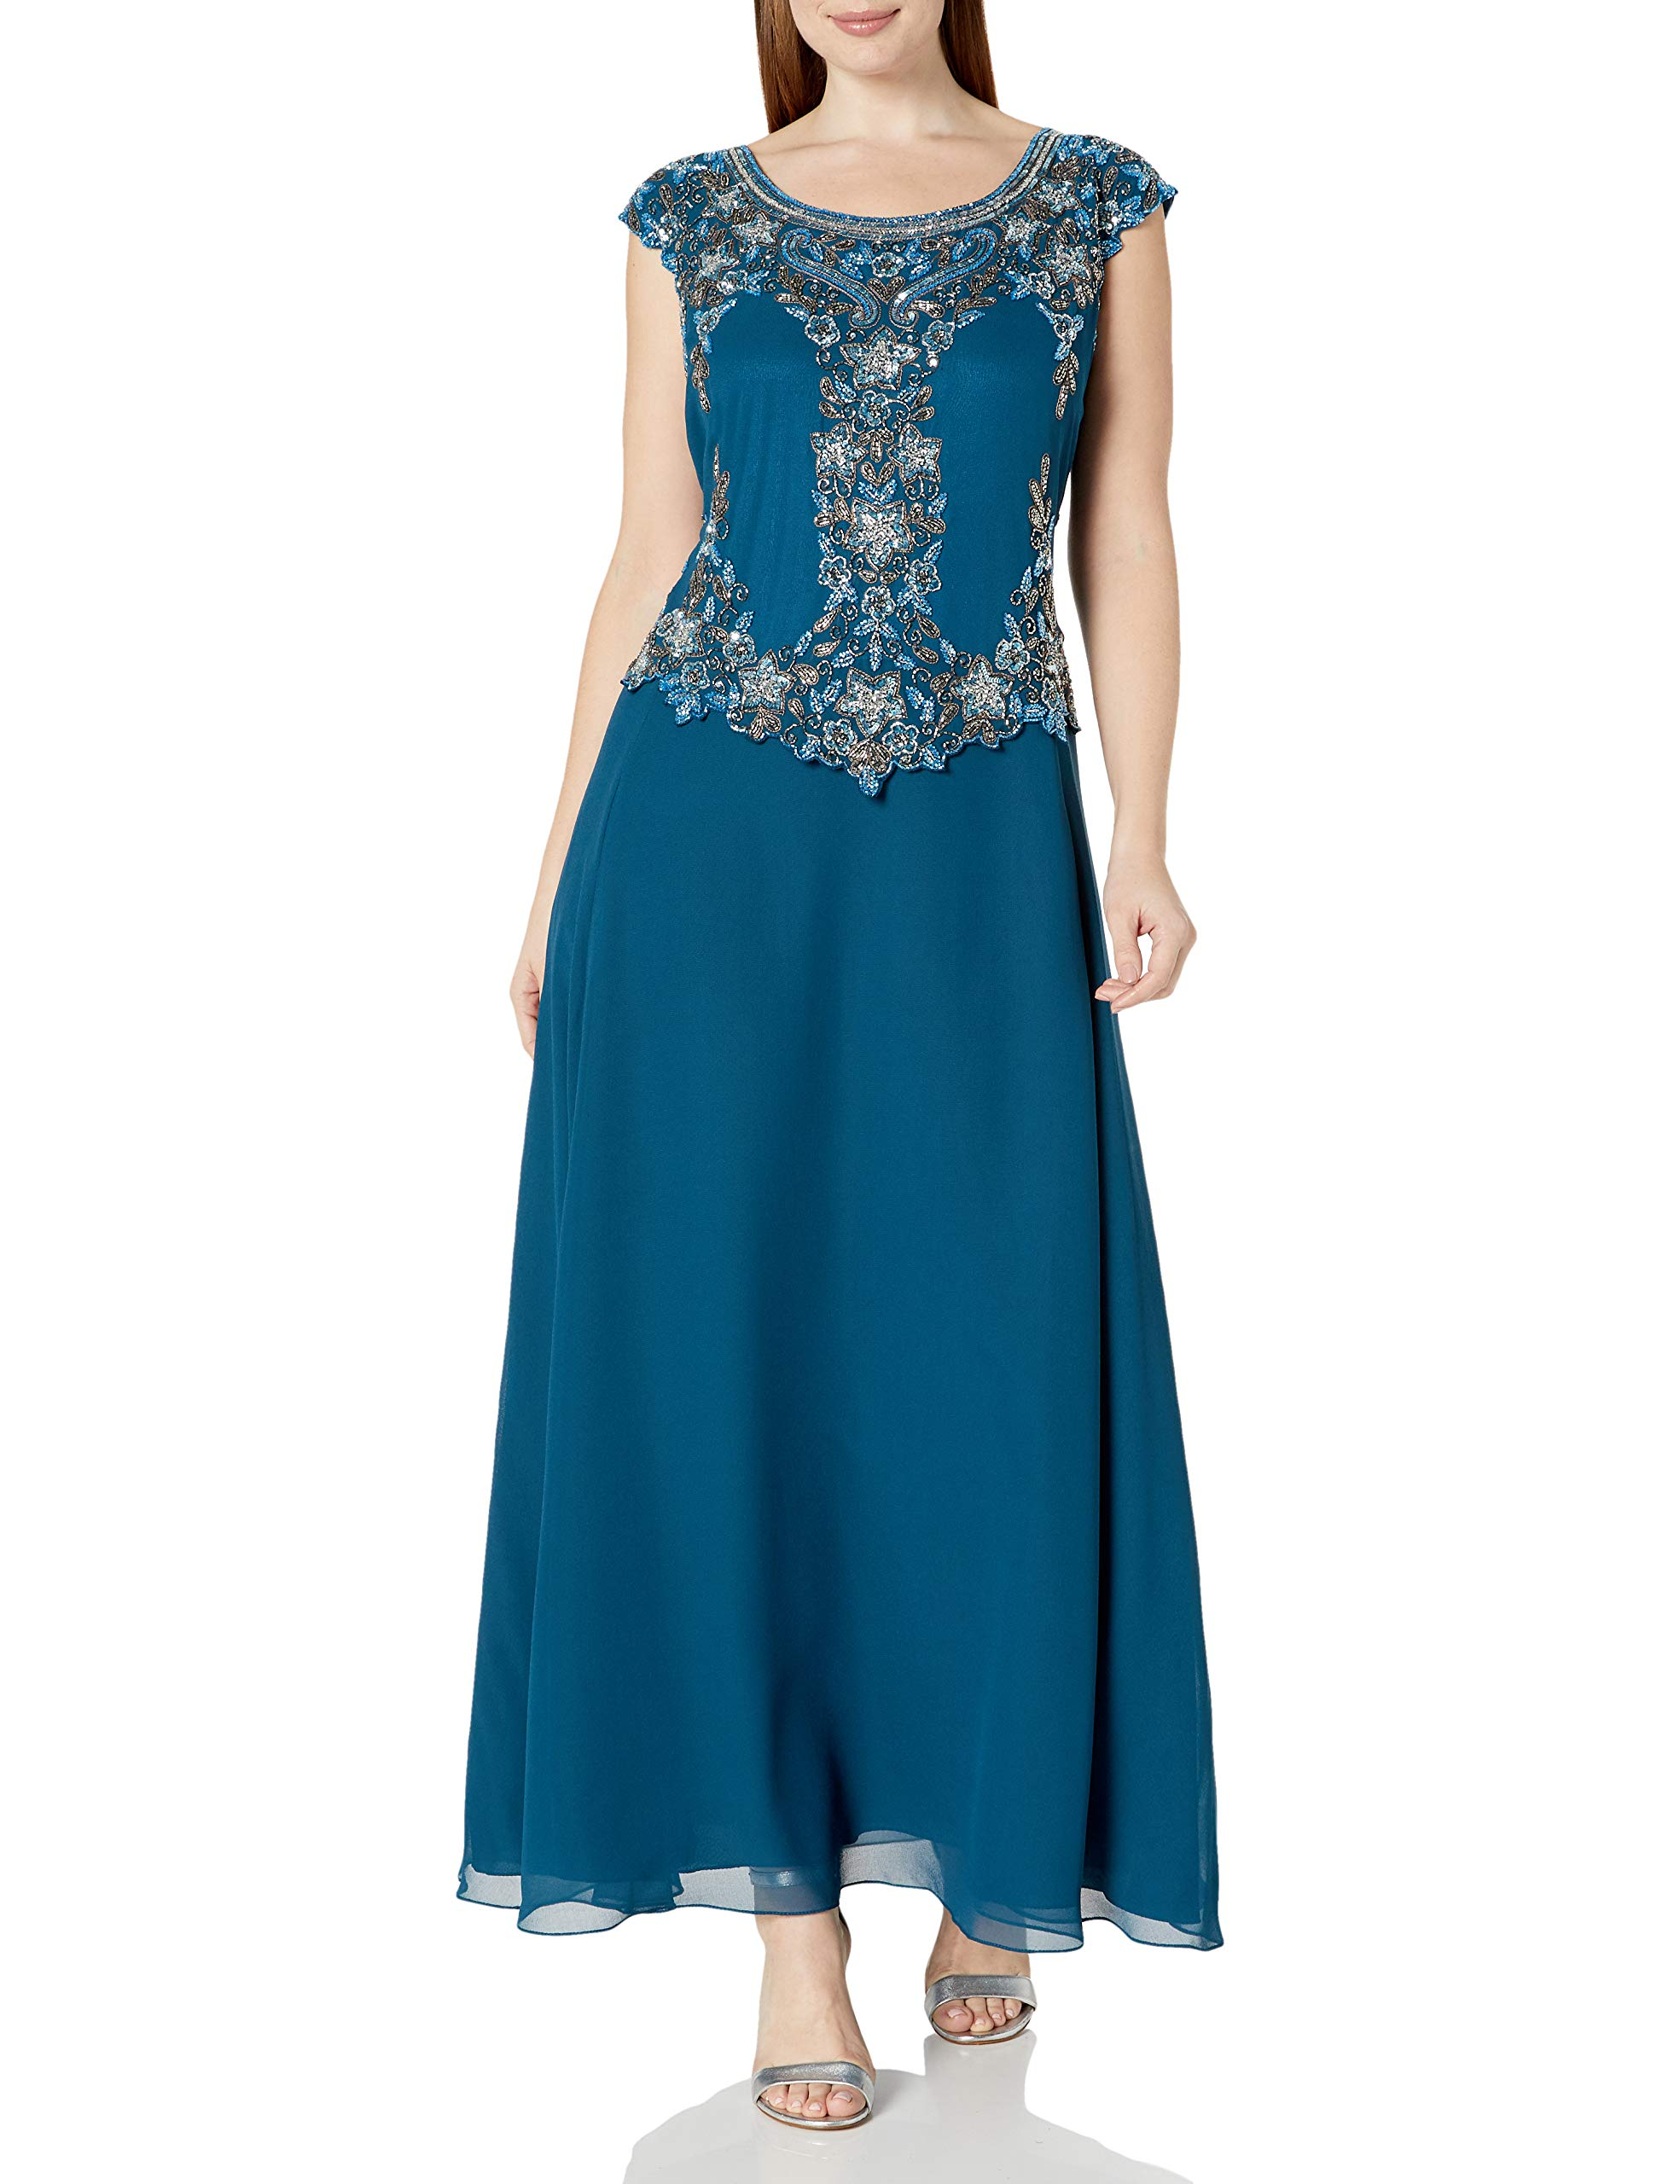 Available at Amazon: J Kara Women's Cap Sleeve Long Beaded Dress